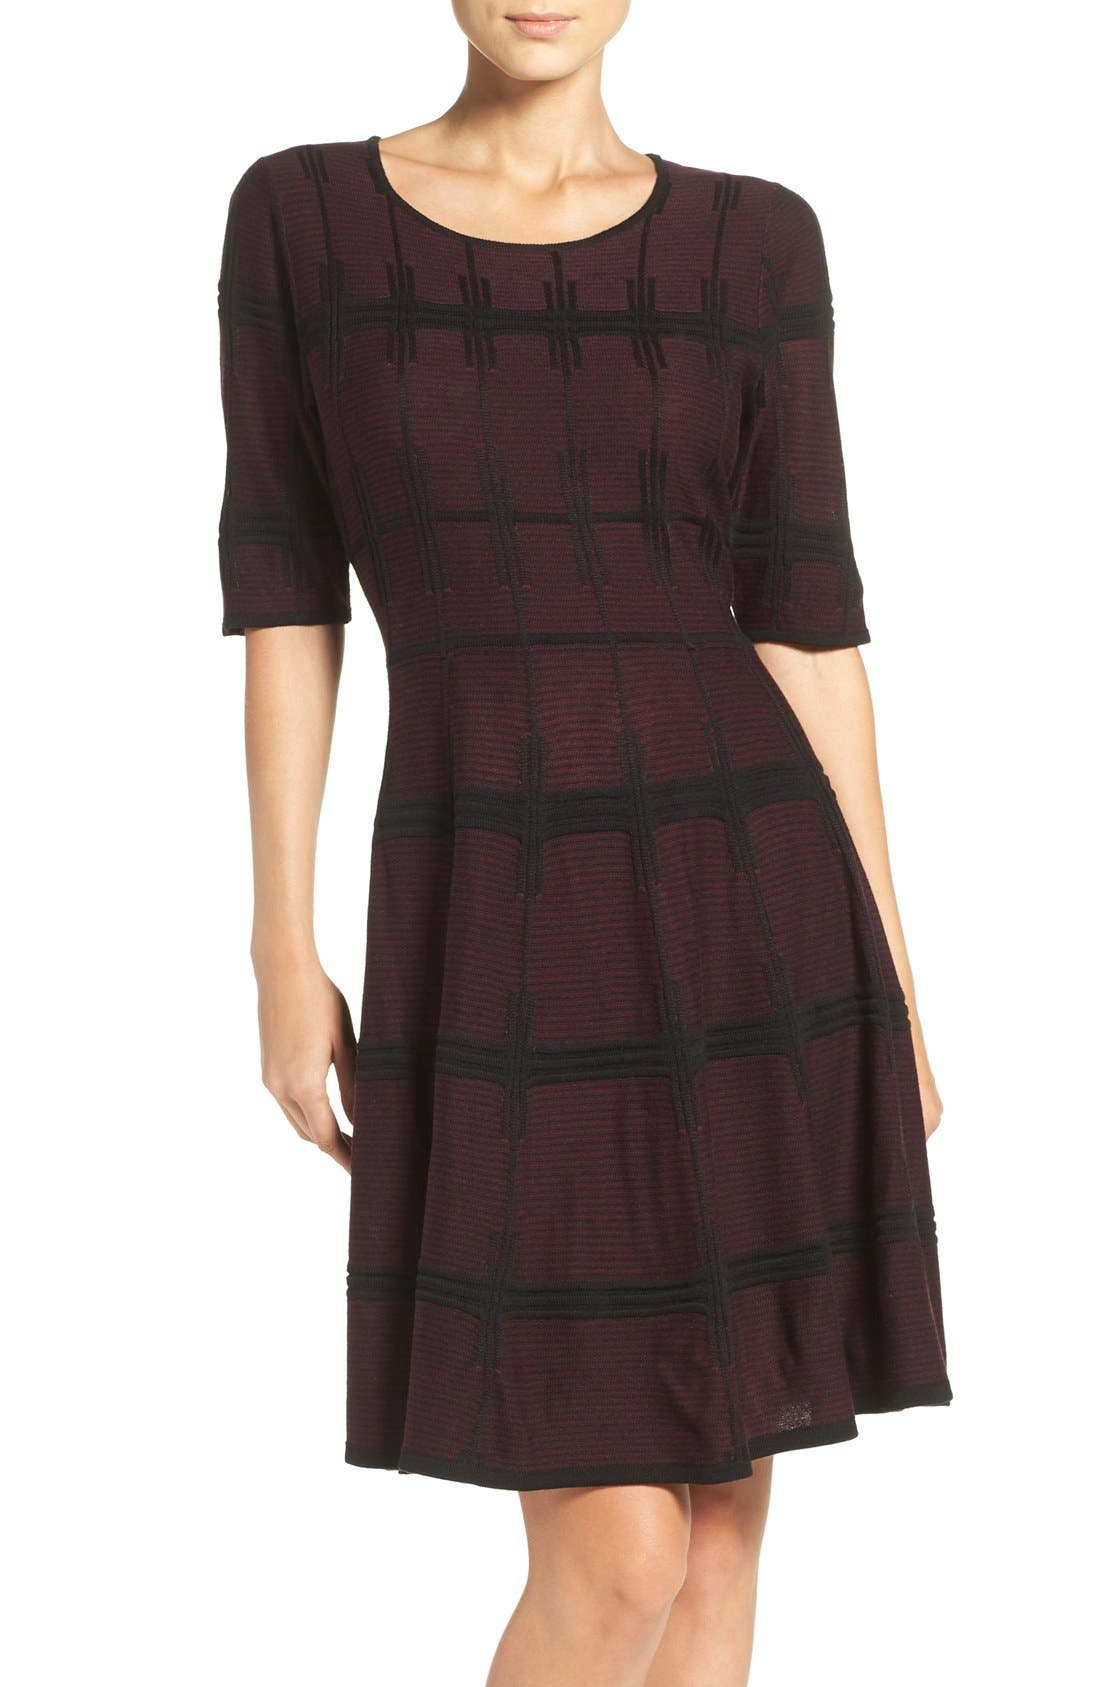 Alternate Image 1 Selected - Ivanka Trump Plaid Sweater Knit Fit & Flare Dress